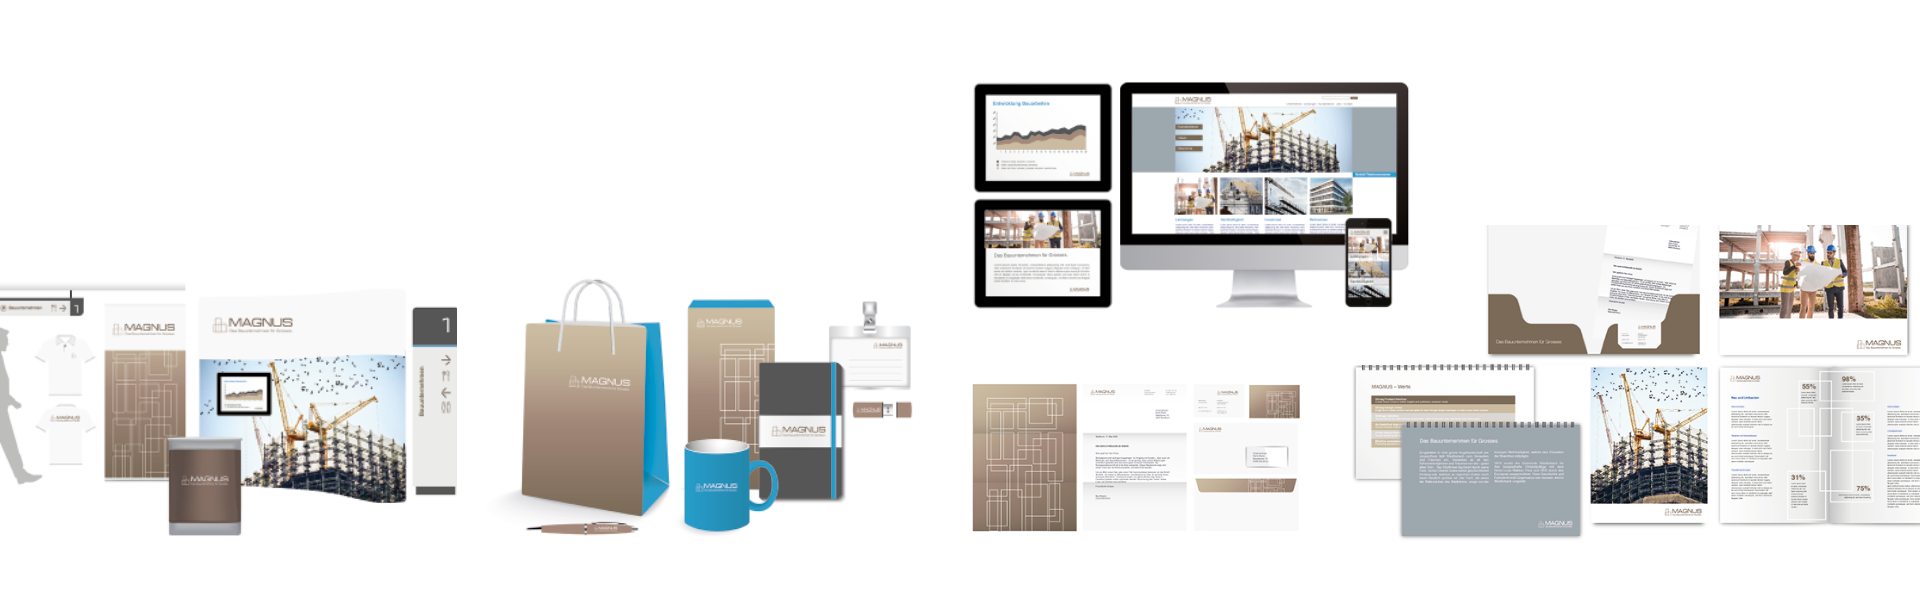 Startpaket CD - Bau & Planung